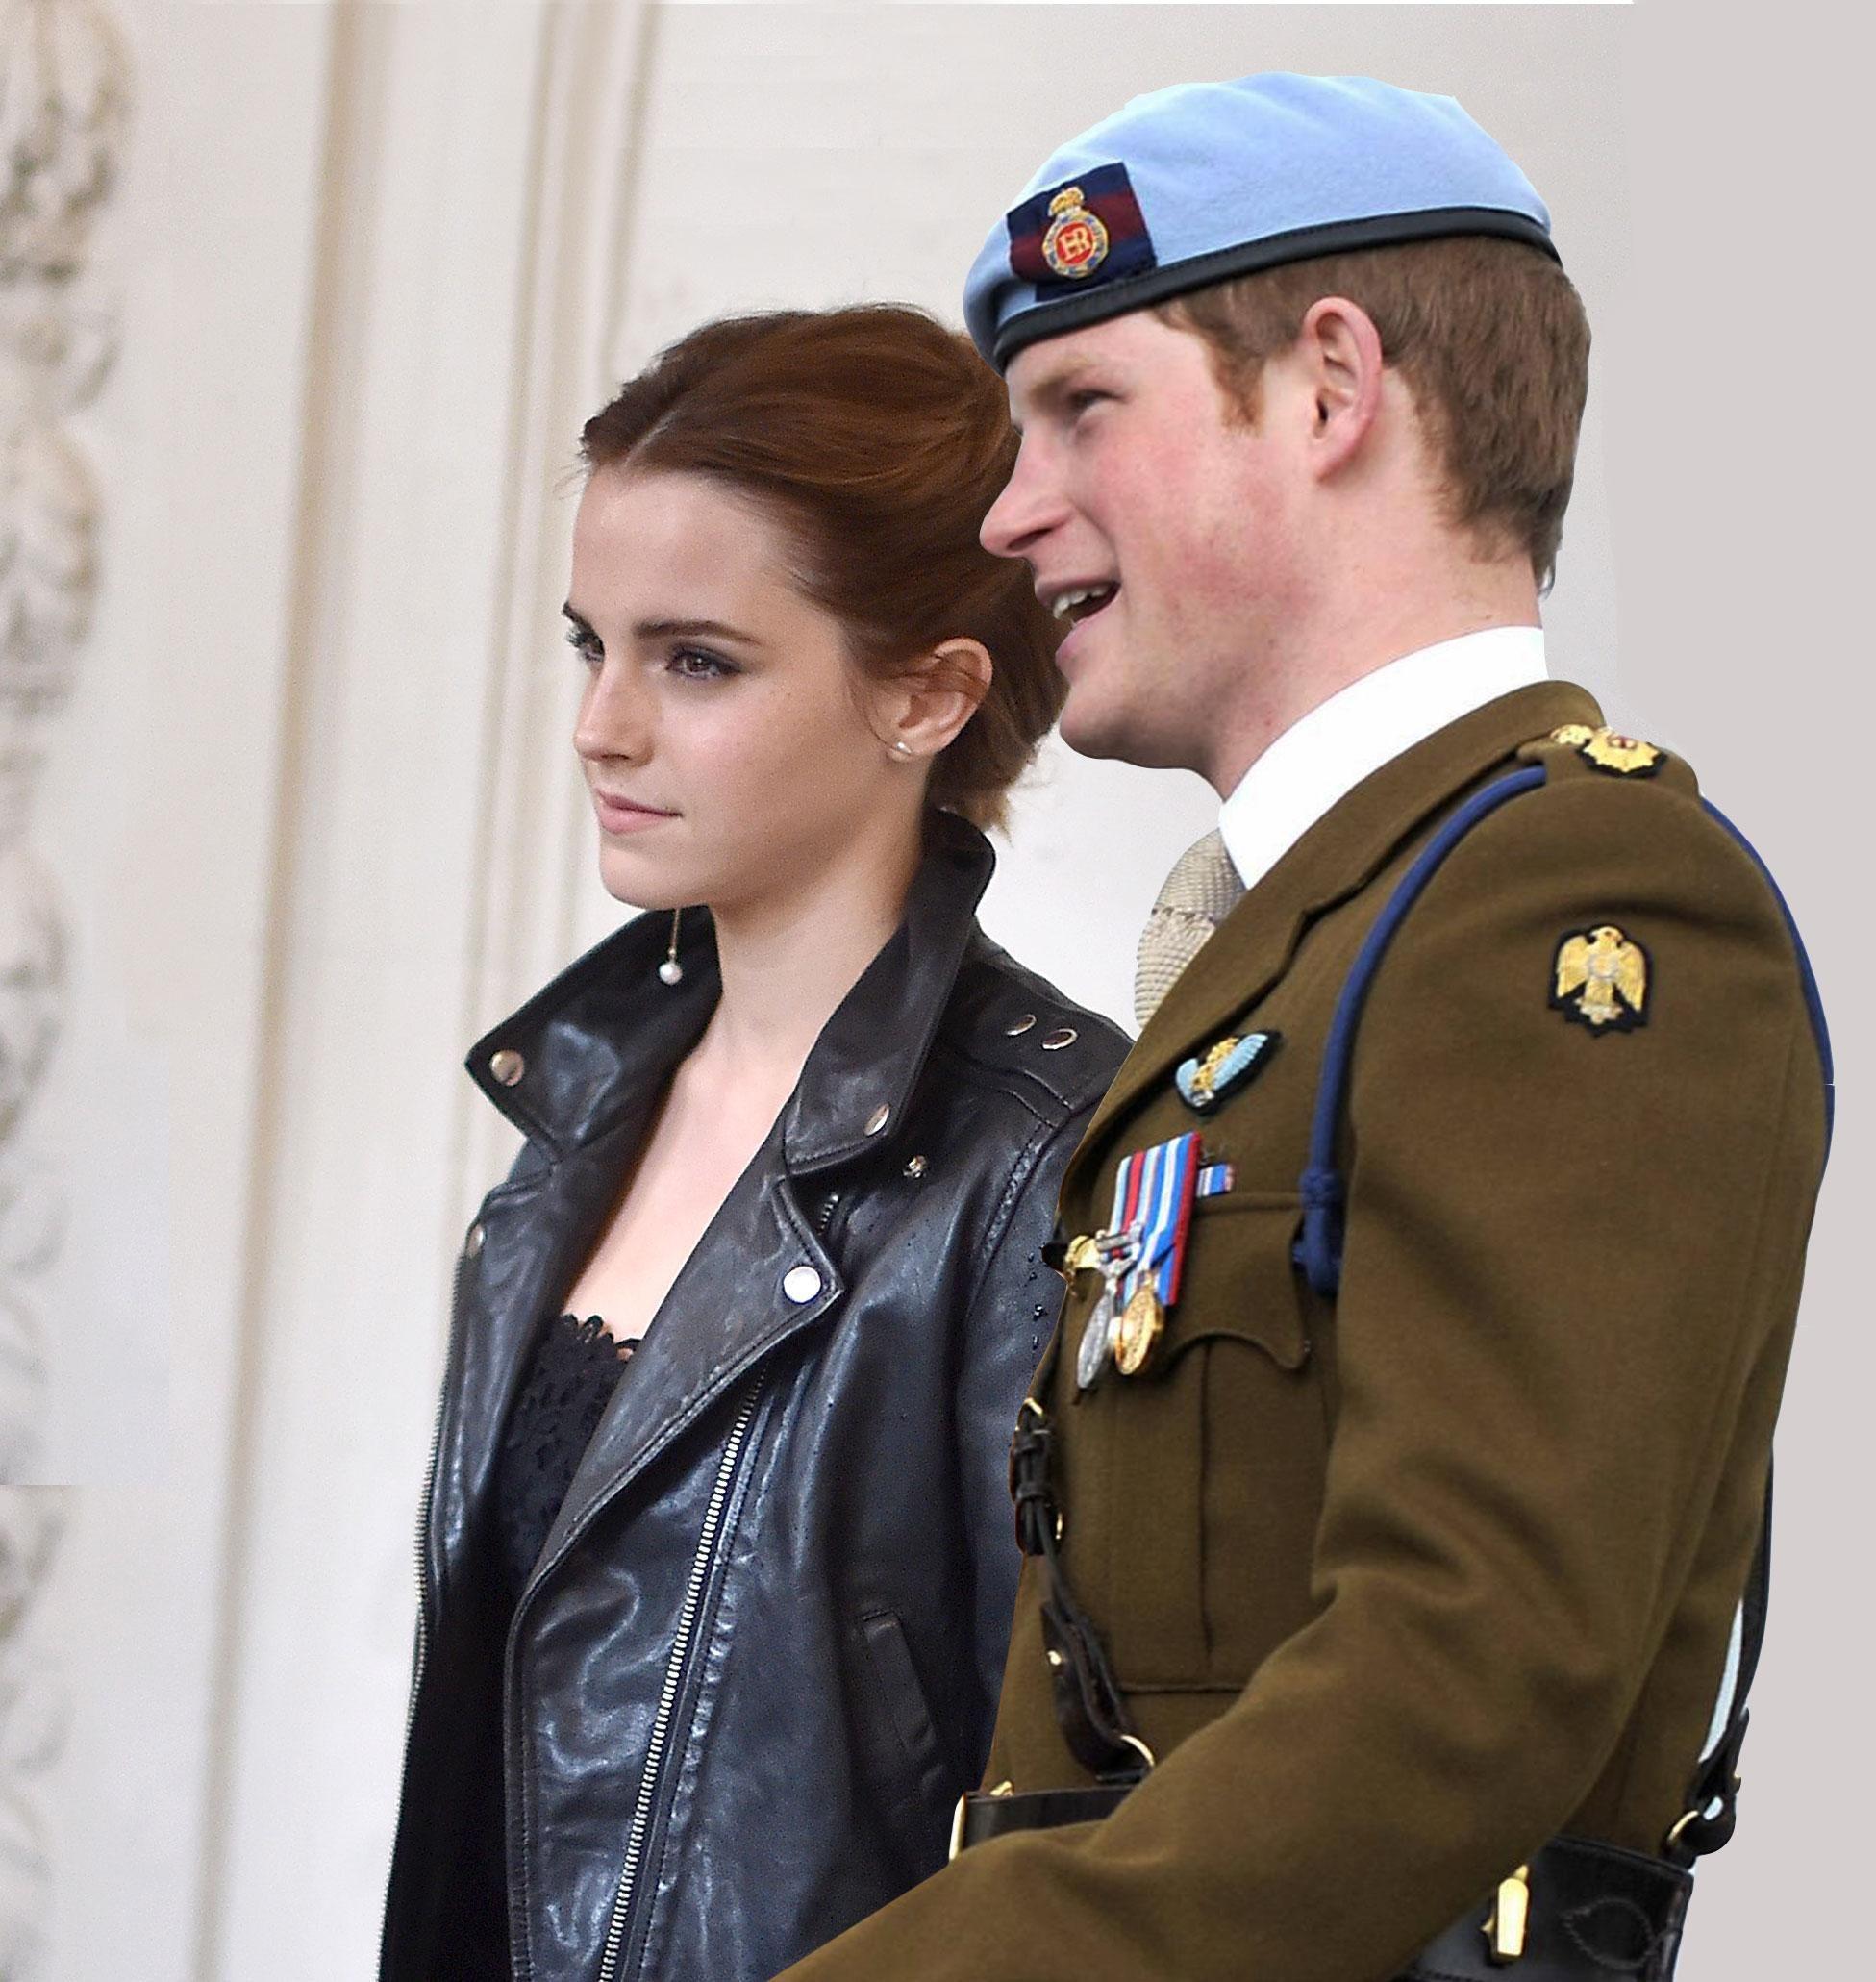 Emma watson dating prince harry uk dating shows